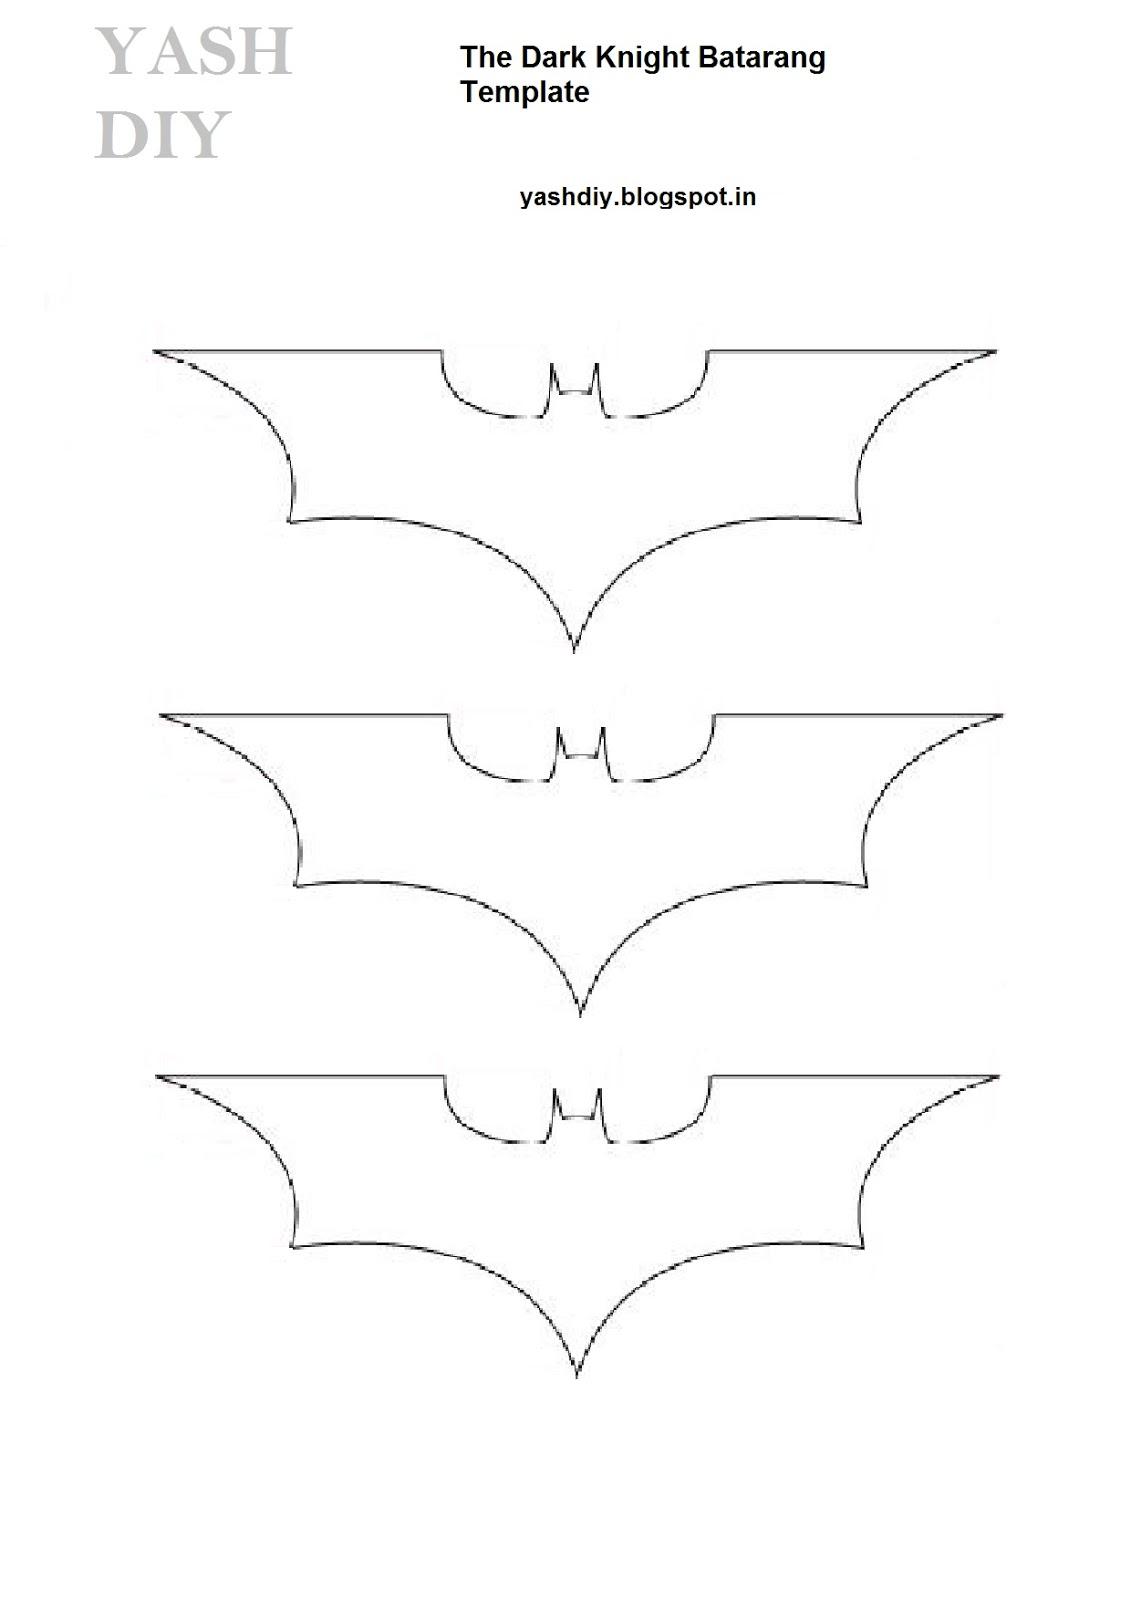 yash diy s templates the dark knight batarang template improved